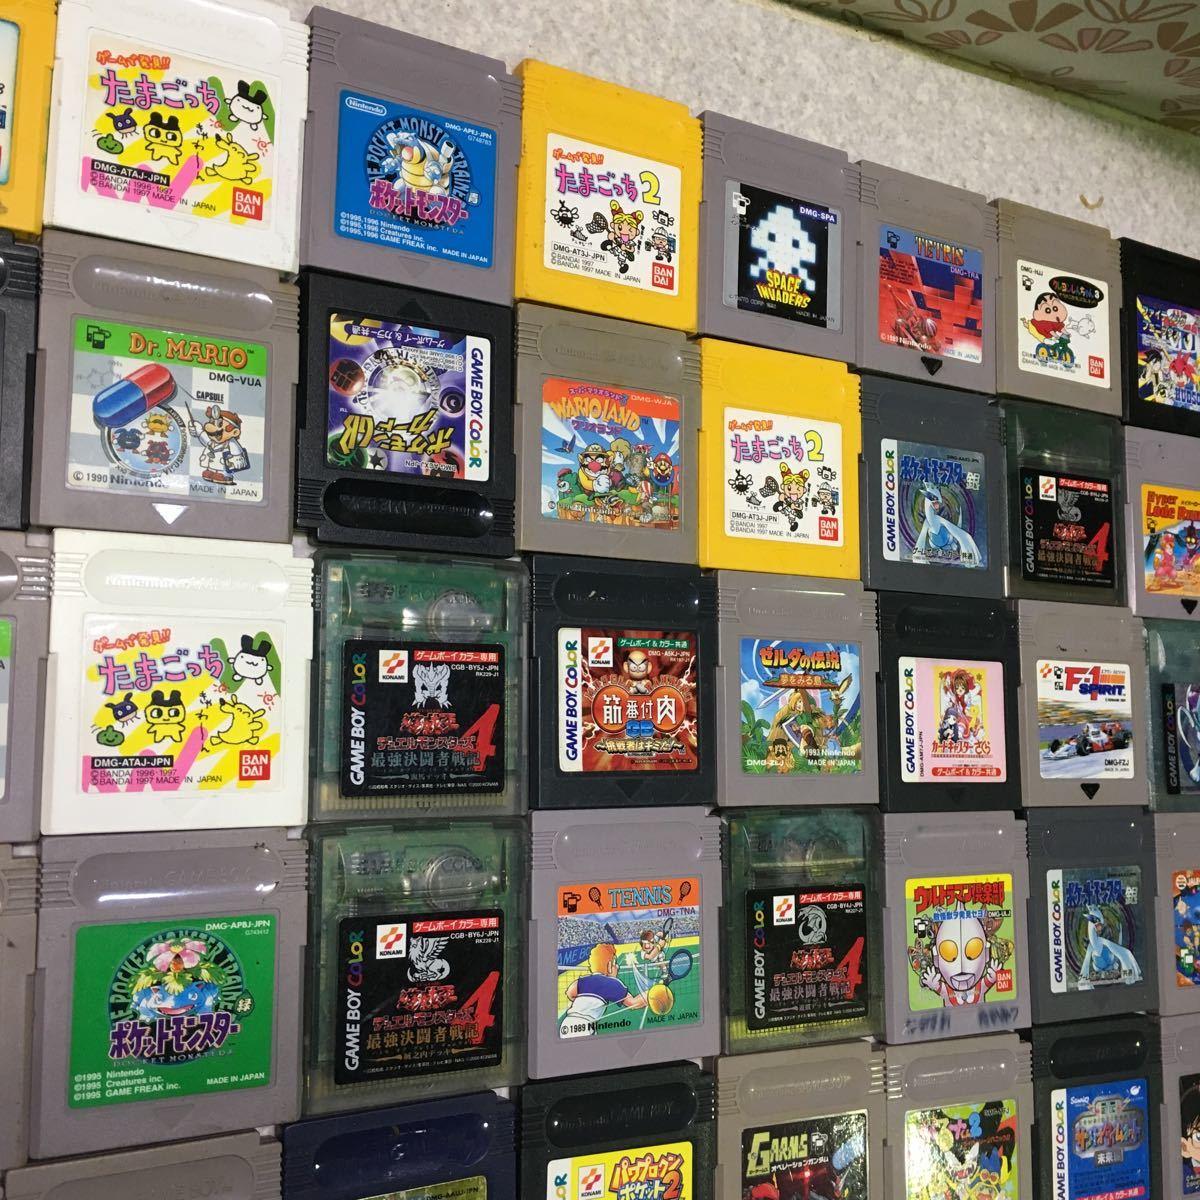 A10-1(J436) Nintendo GB ゲームボーイソフト まとめて223点 動作未確認 ジャンク品_画像4